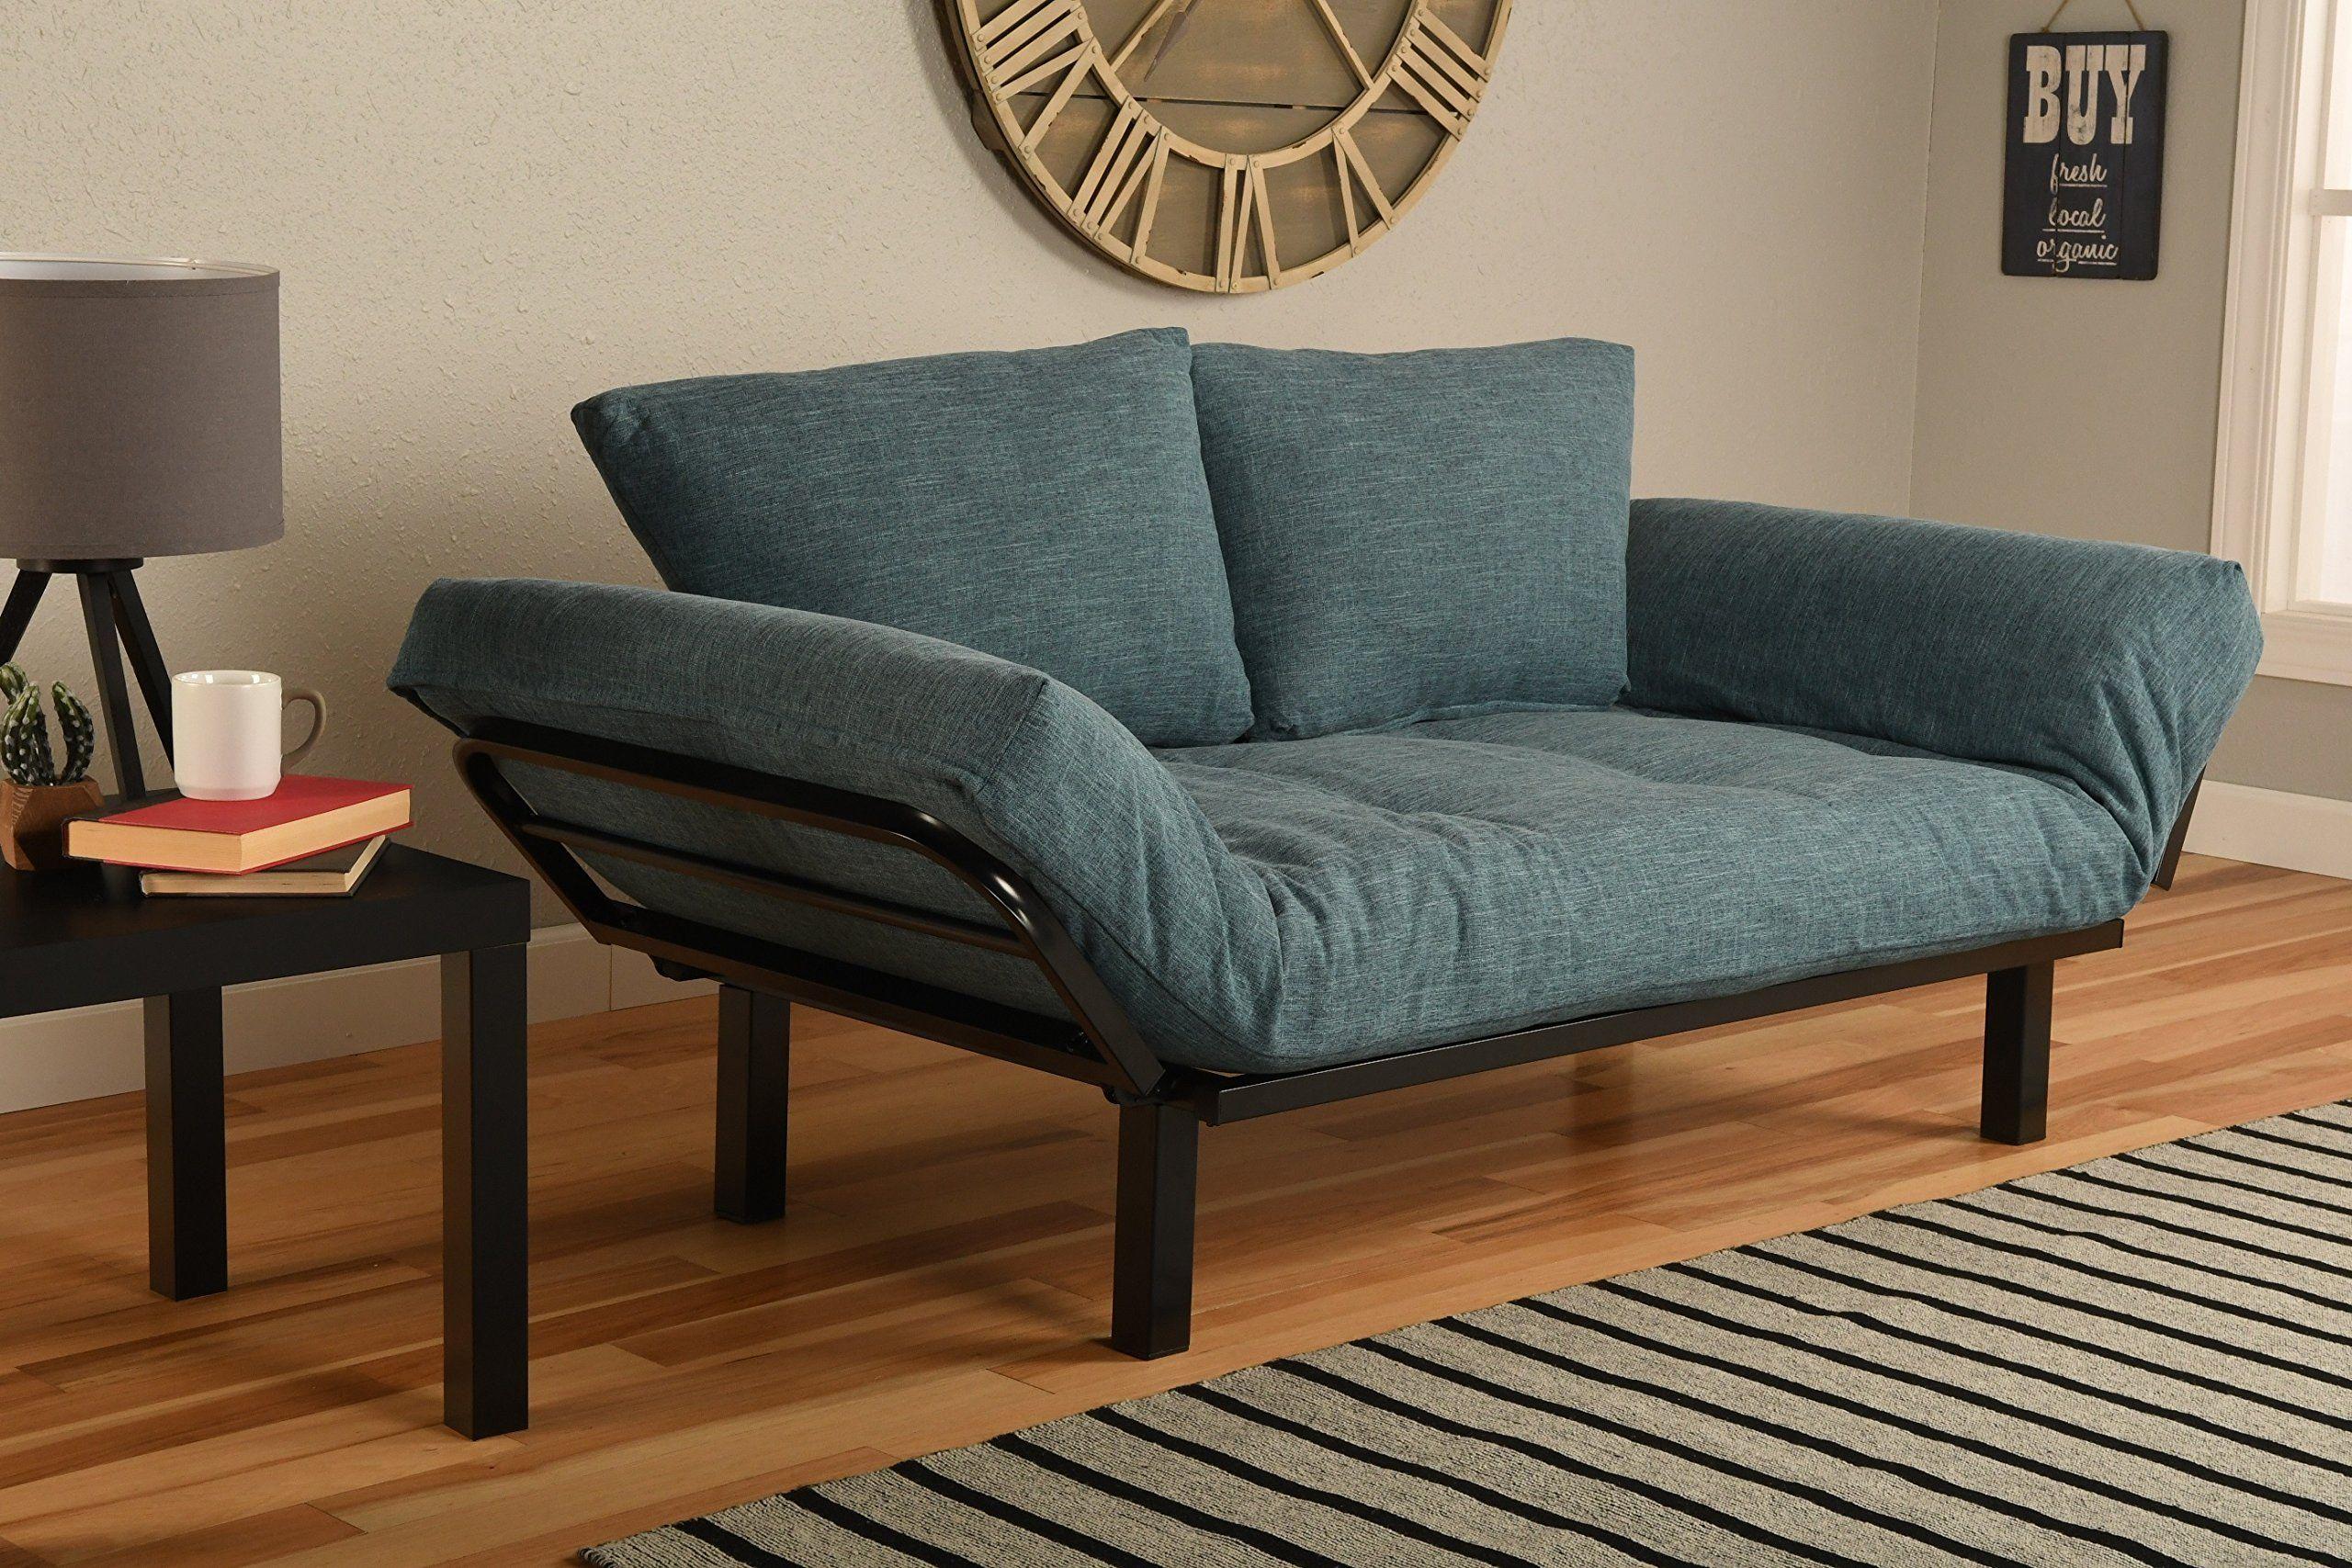 Best Futon Lounger Sit Lounge Sleep Smaller Size Furniture is